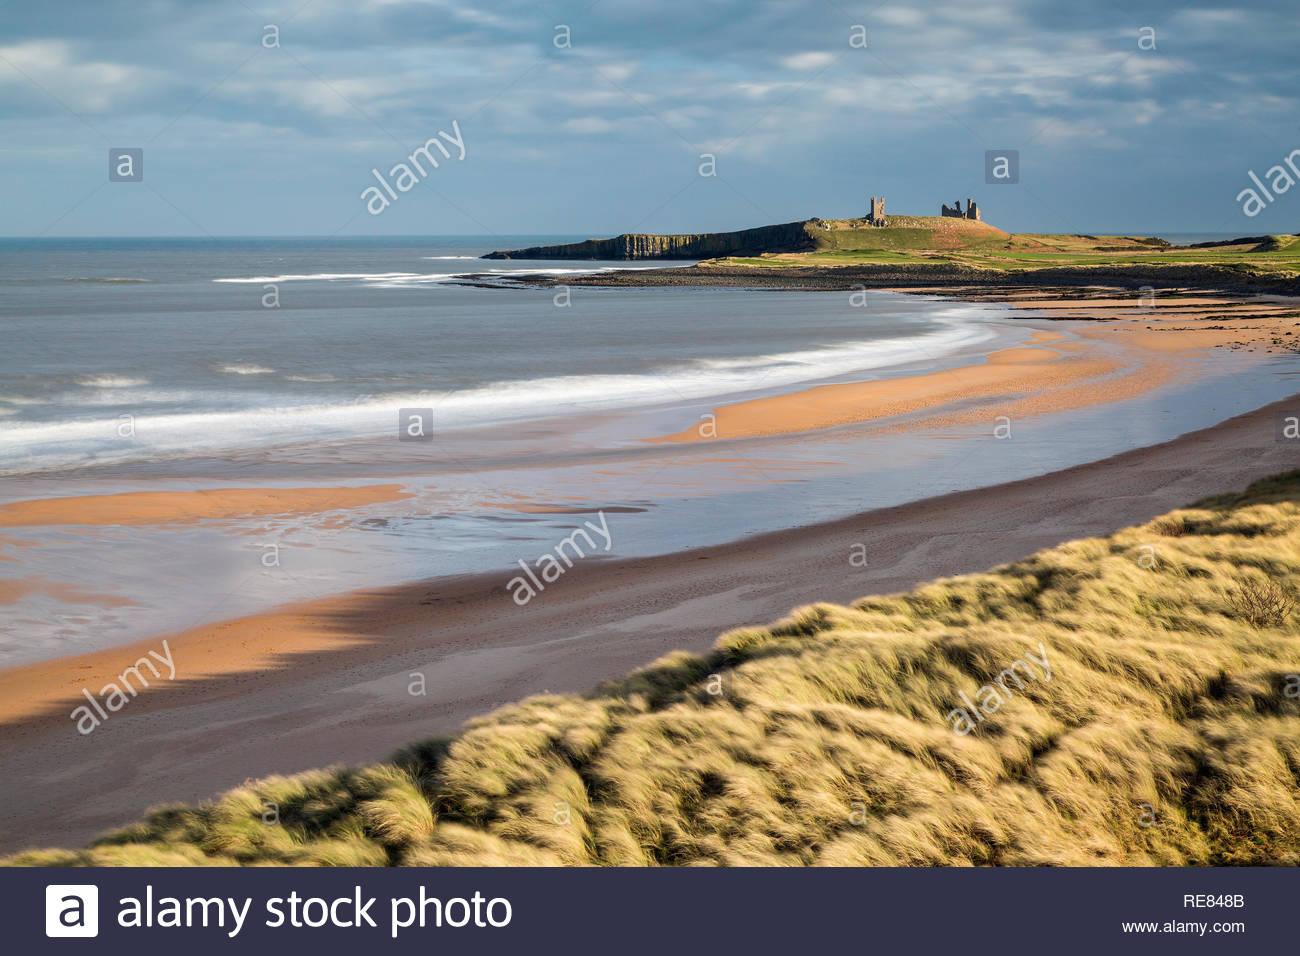 Dunstanburgh Castle and Embleton Bay, Northumberland, England - Stock Image